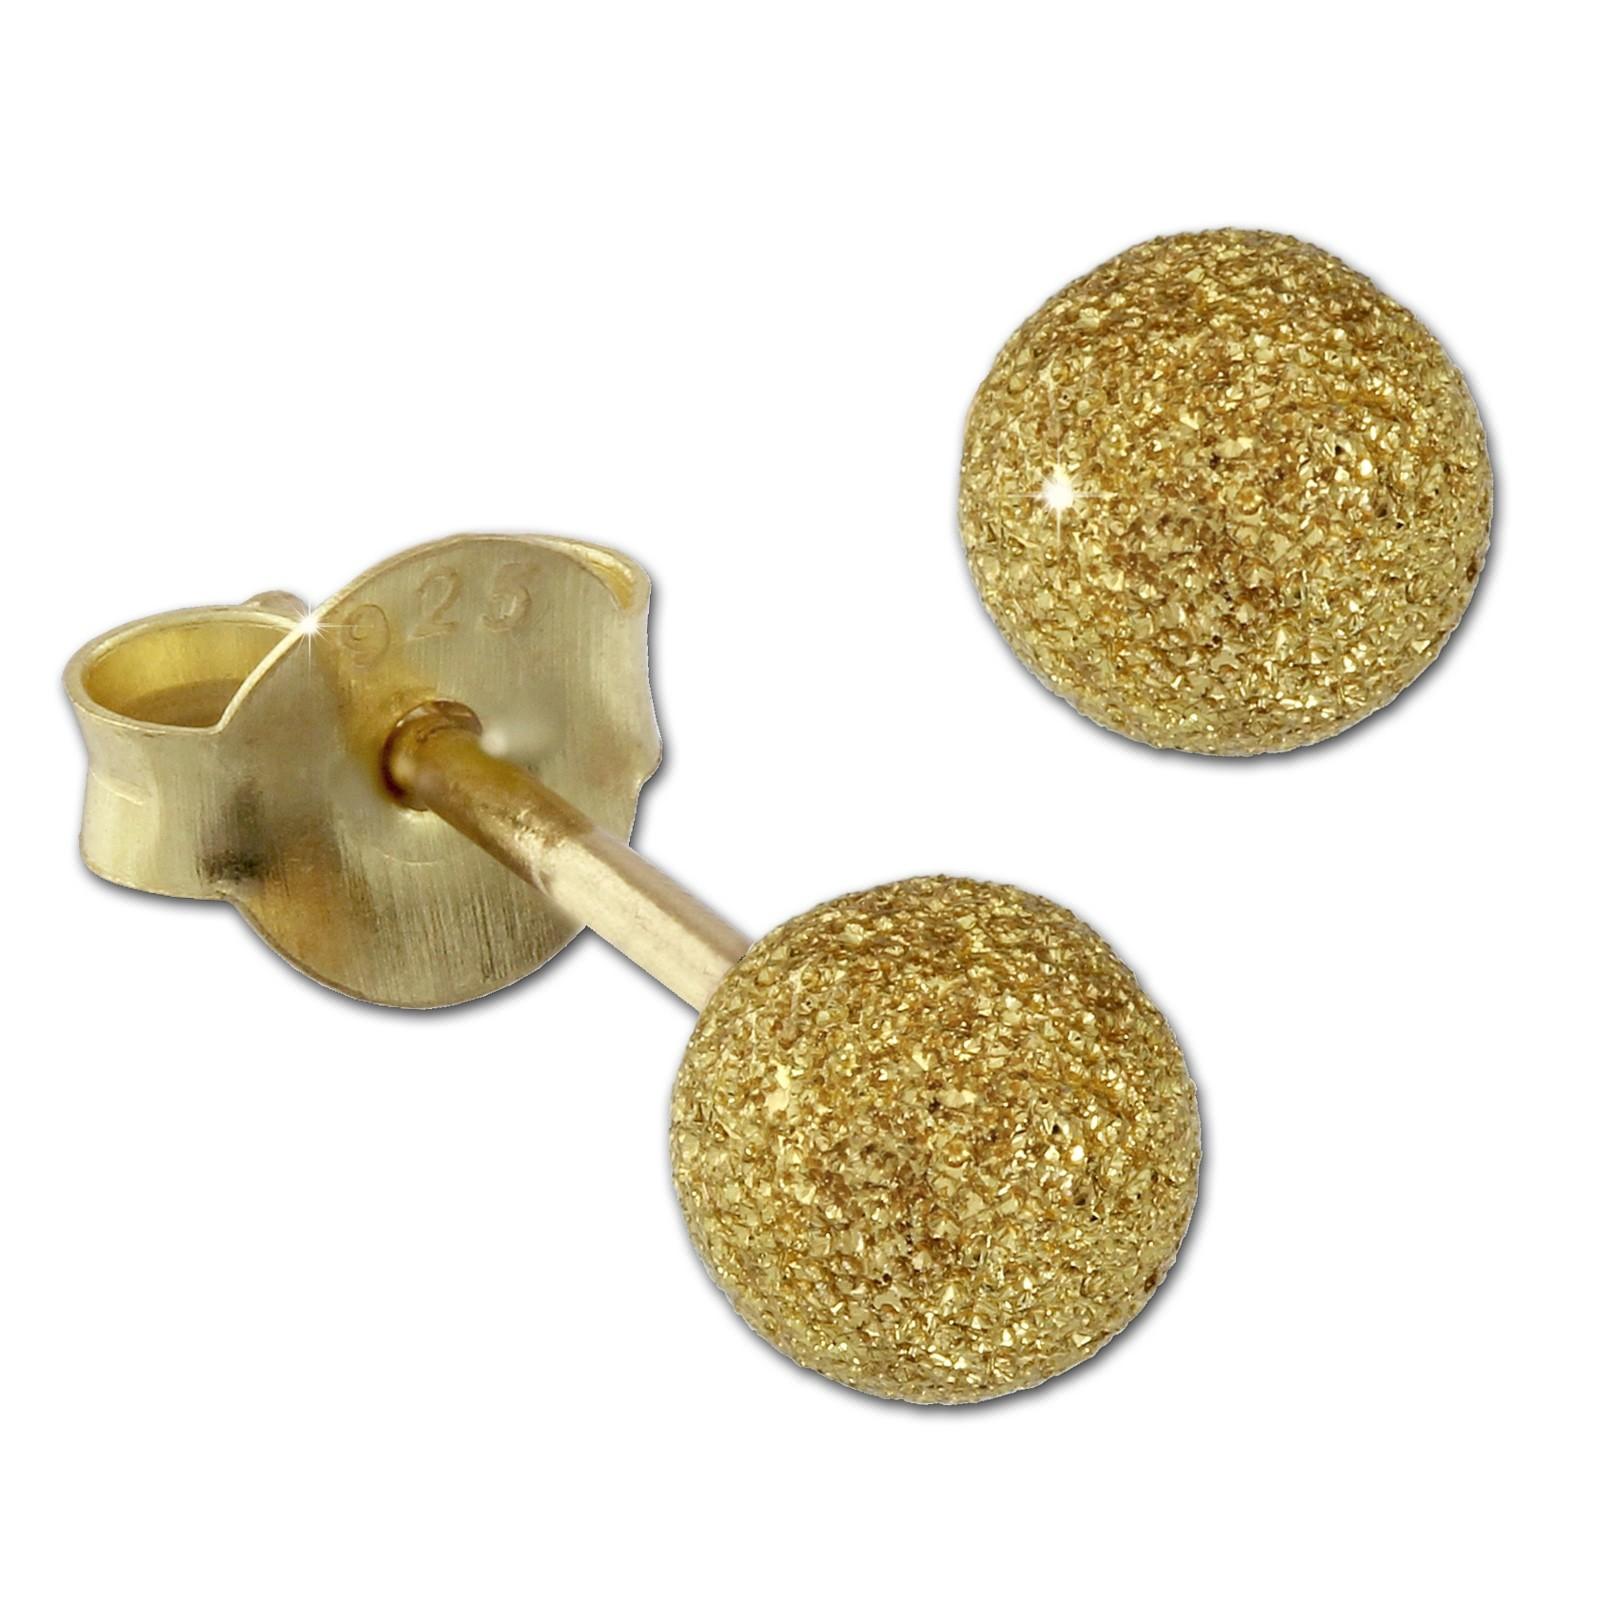 SilberDream Ohrstecker vergoldet Kugel 4mm diamantiert 925er Ohrring SDO9514Y